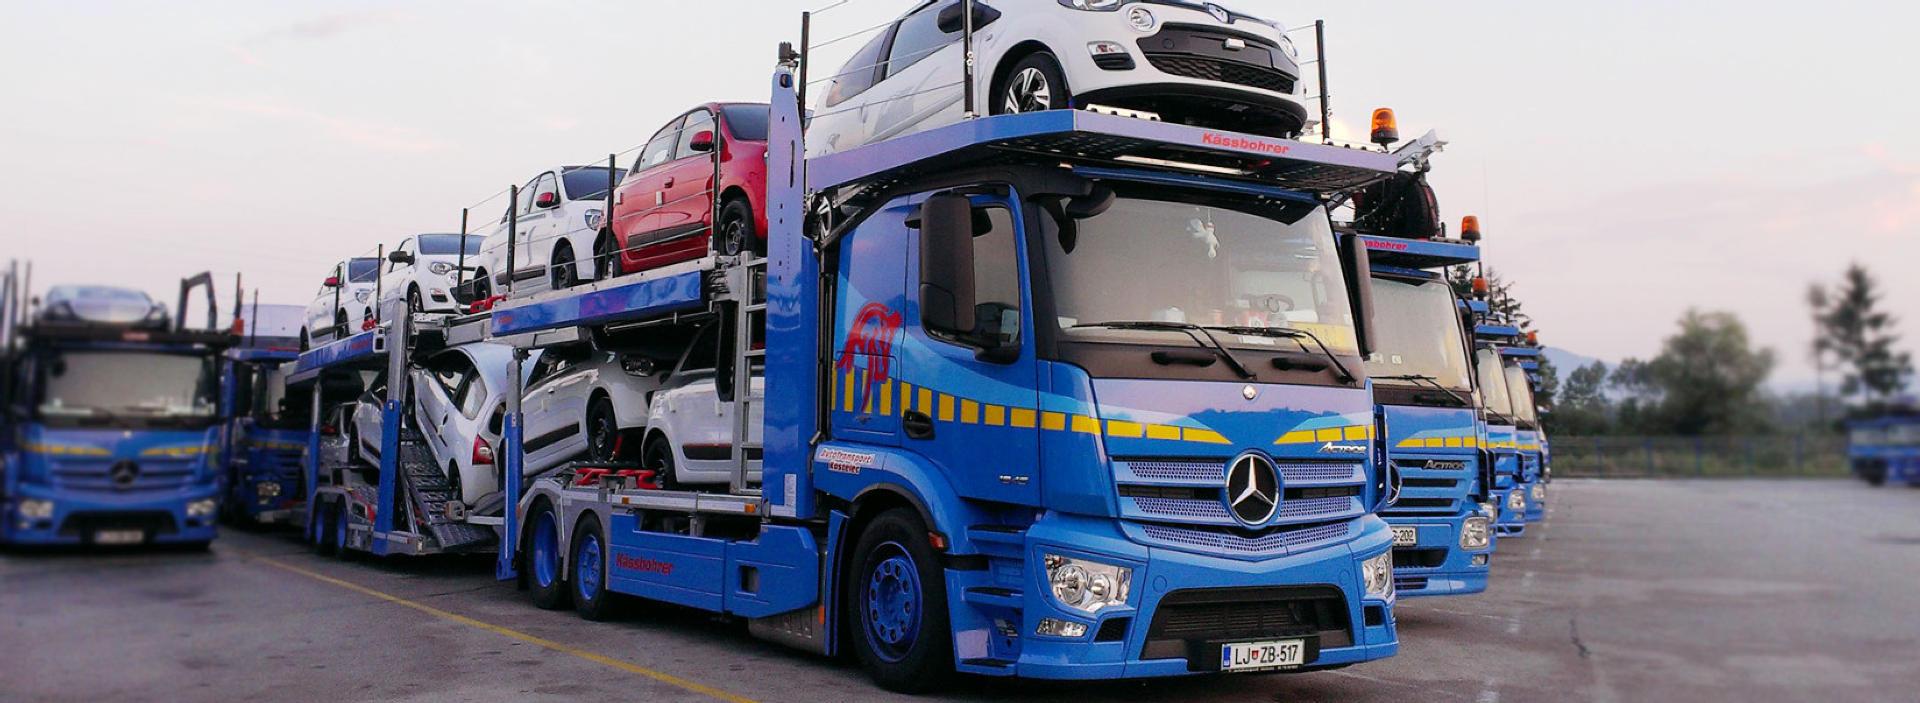 AT Kastelec usluge skladištenja, prijevoza i carinjenja vozila